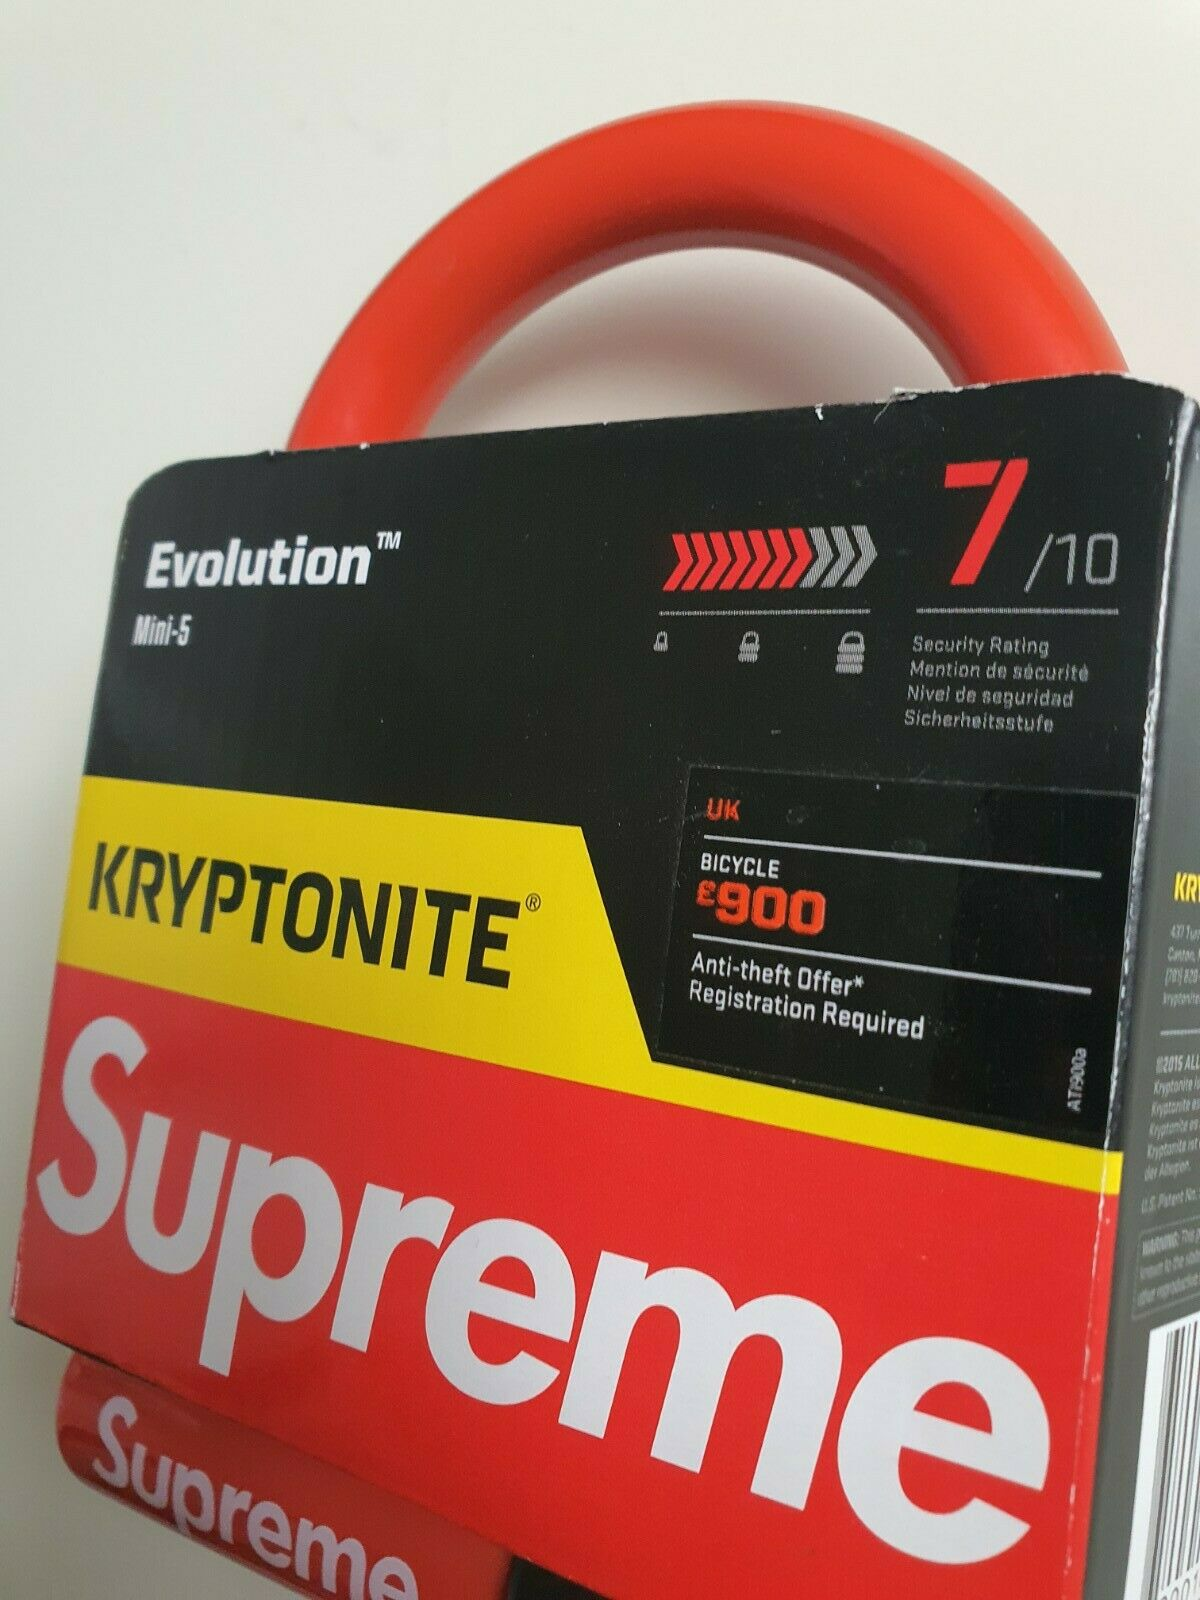 New Unopened Rare FW15 Supreme Kryptonite evolution mini 5 bicycle lock Red